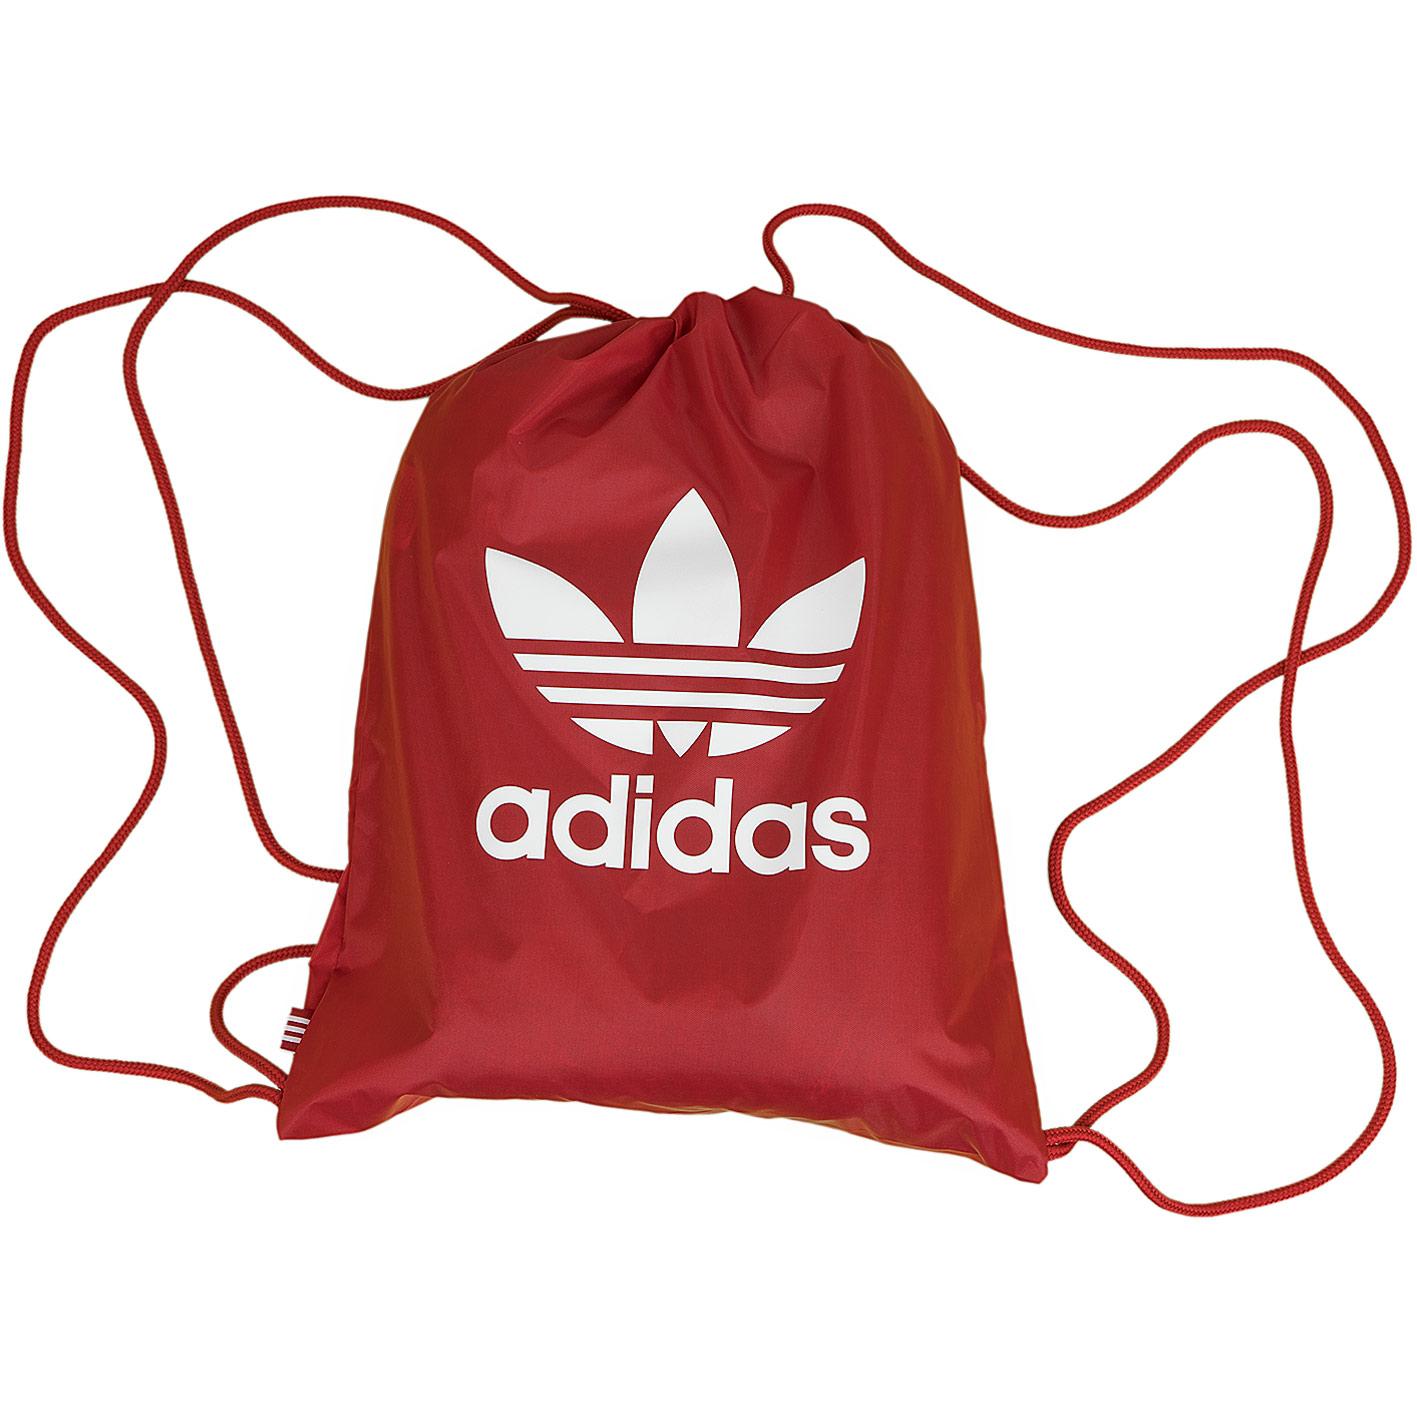 bd9eb25221 ☆ Adidas Originals Gym Bag Trefoil rot - hier bestellen!